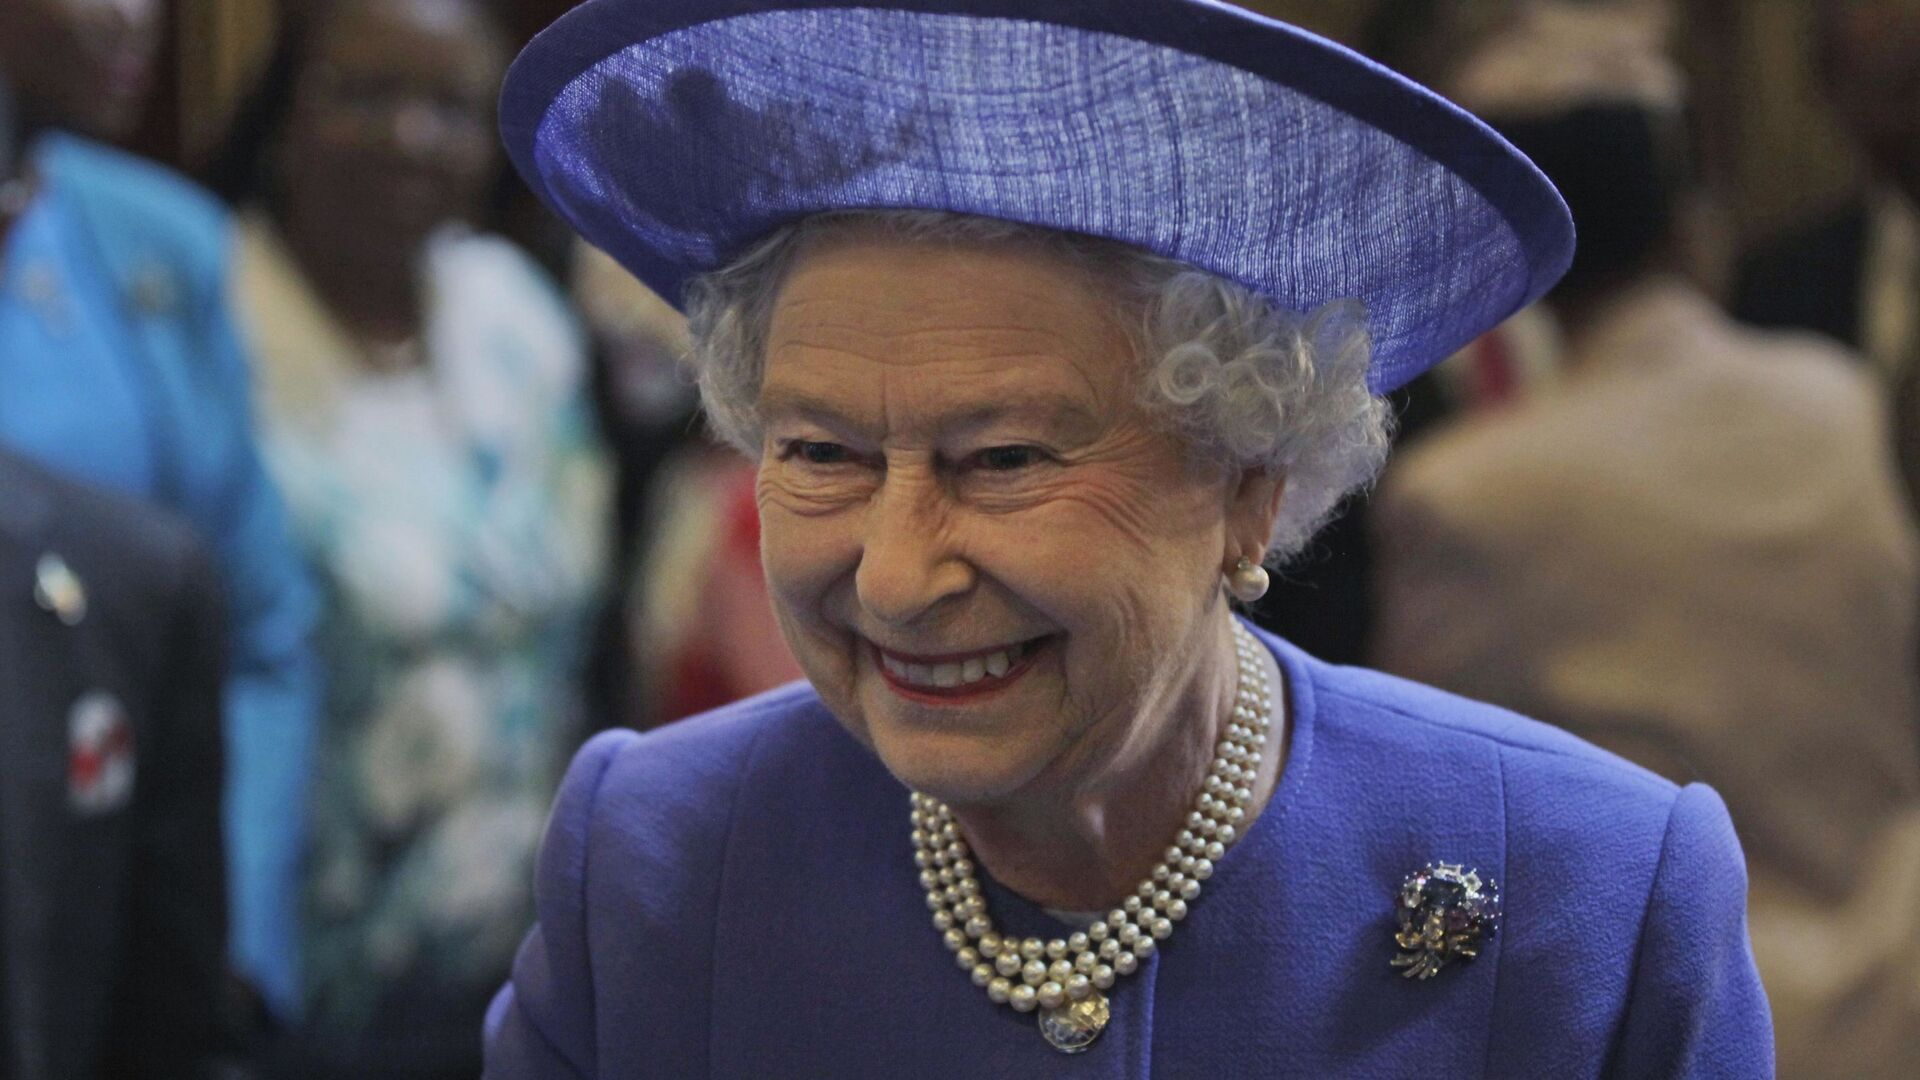 La Regina Elisabetta II - Sputnik Italia, 1920, 10.09.2021